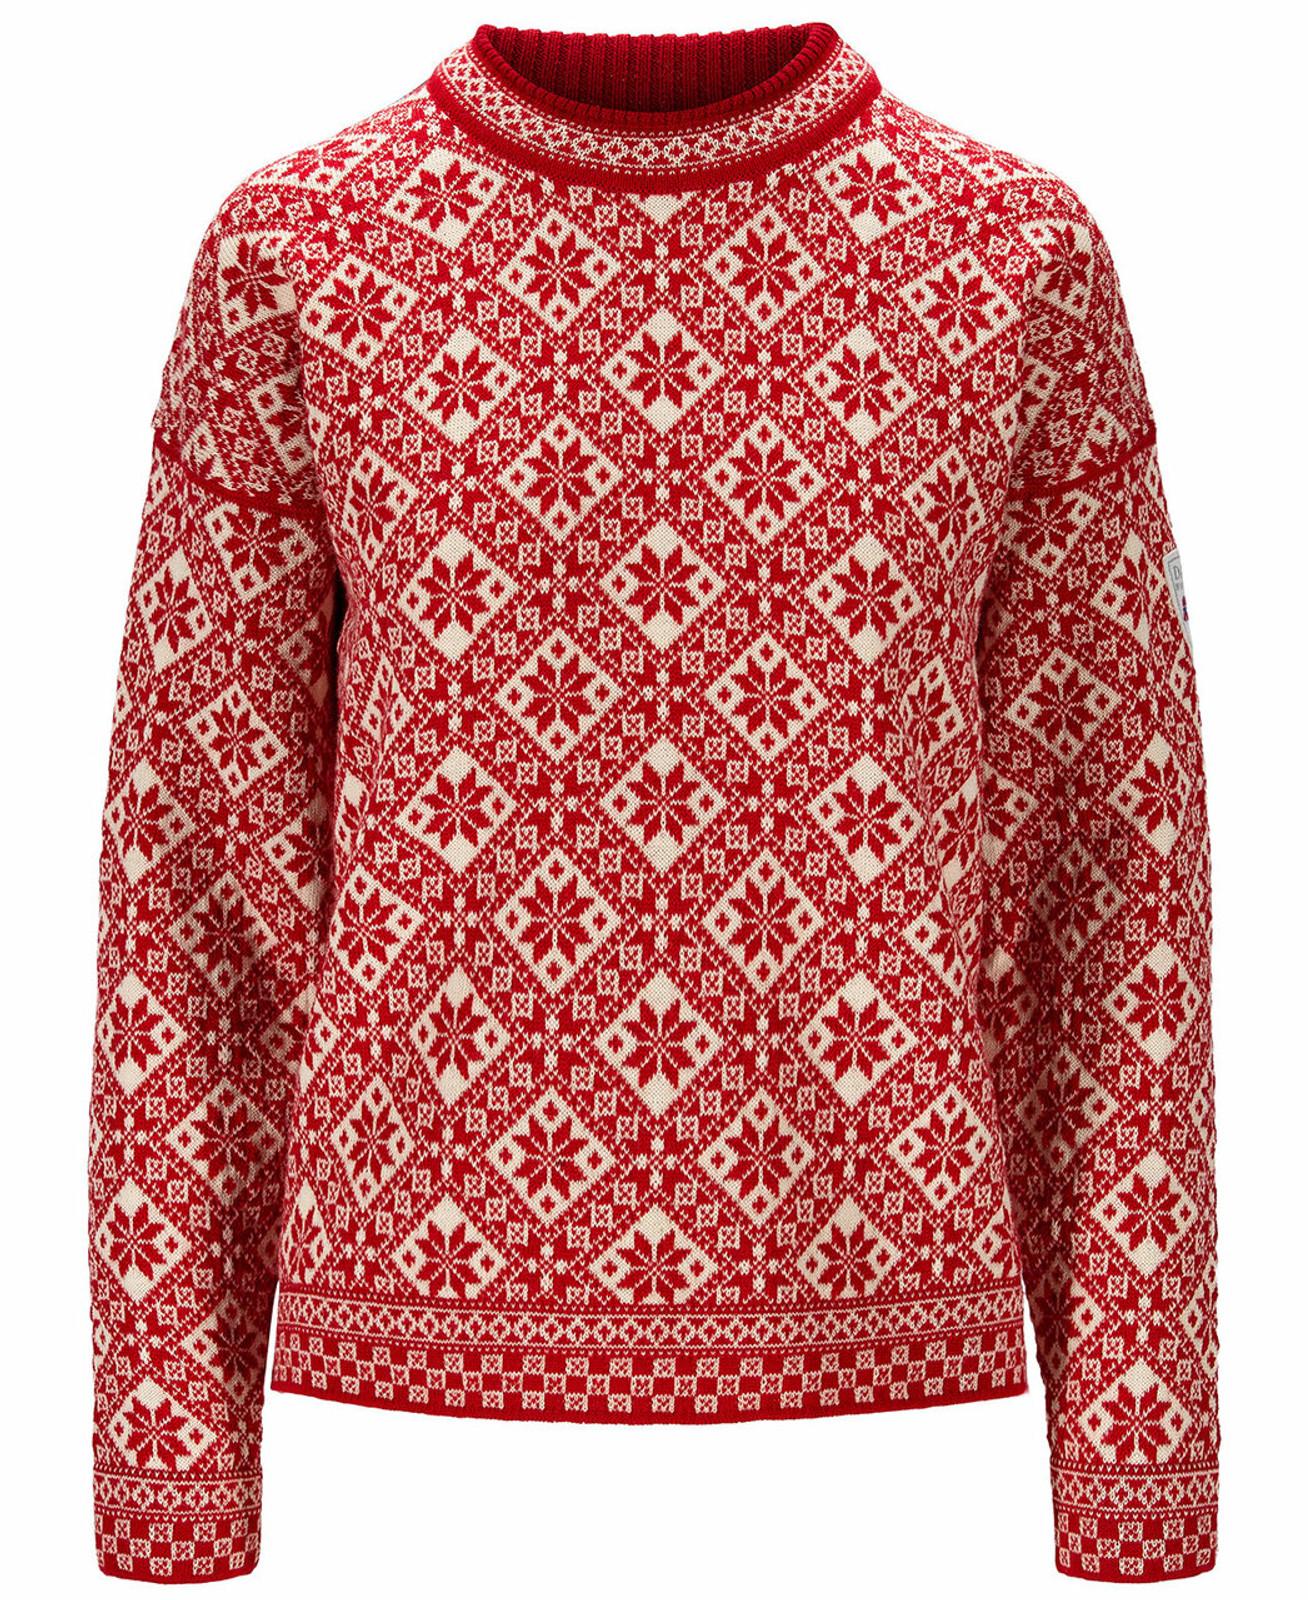 Dale of Norway Bjorøy Sweater, Ladies - Raspberry/Off White/Marine, 94401-B